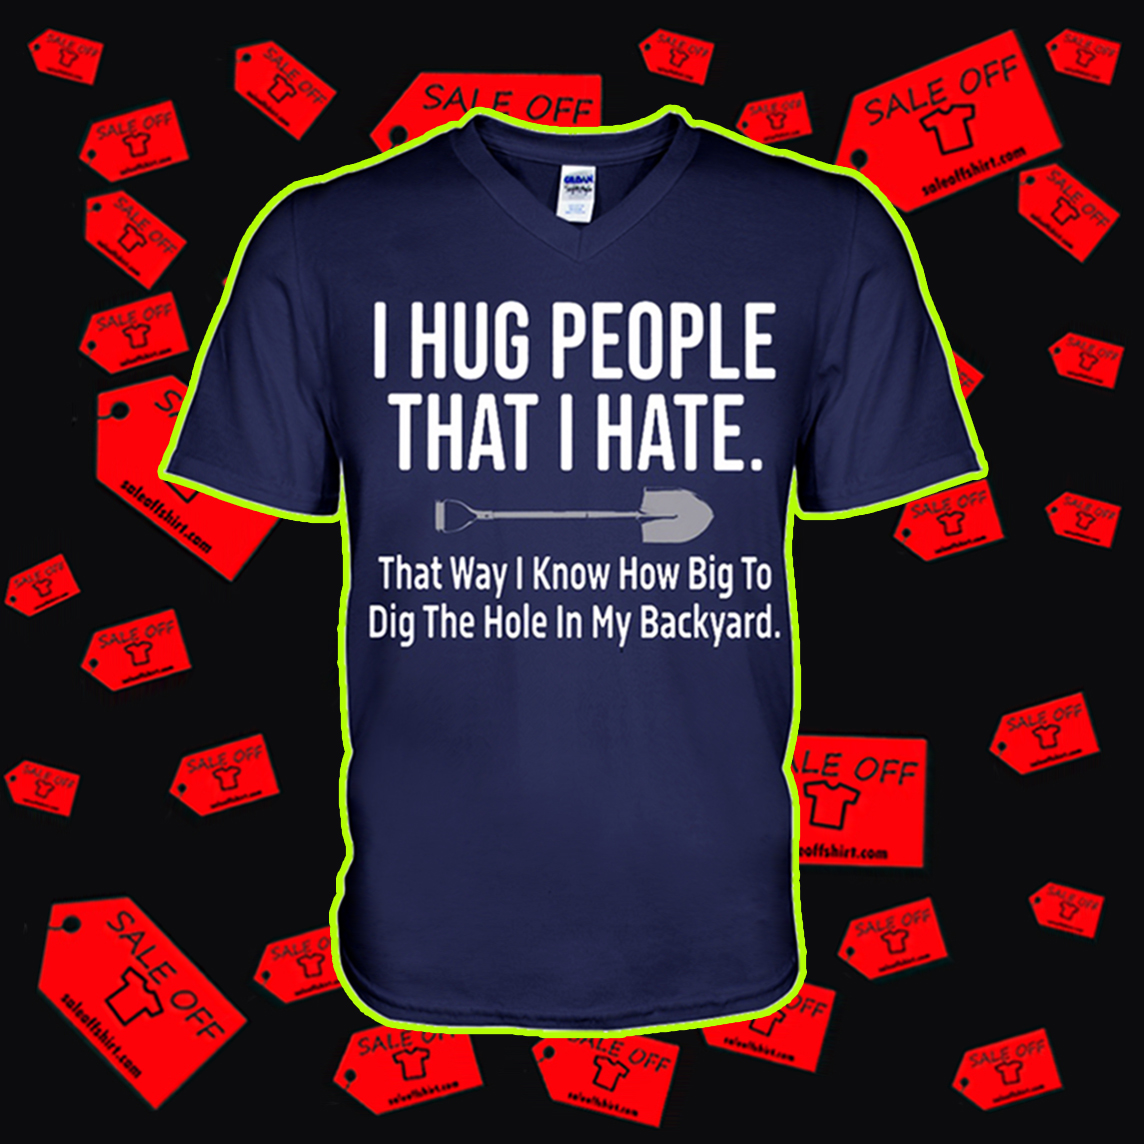 I-hug-people-that-I-hate-that-way-I-know